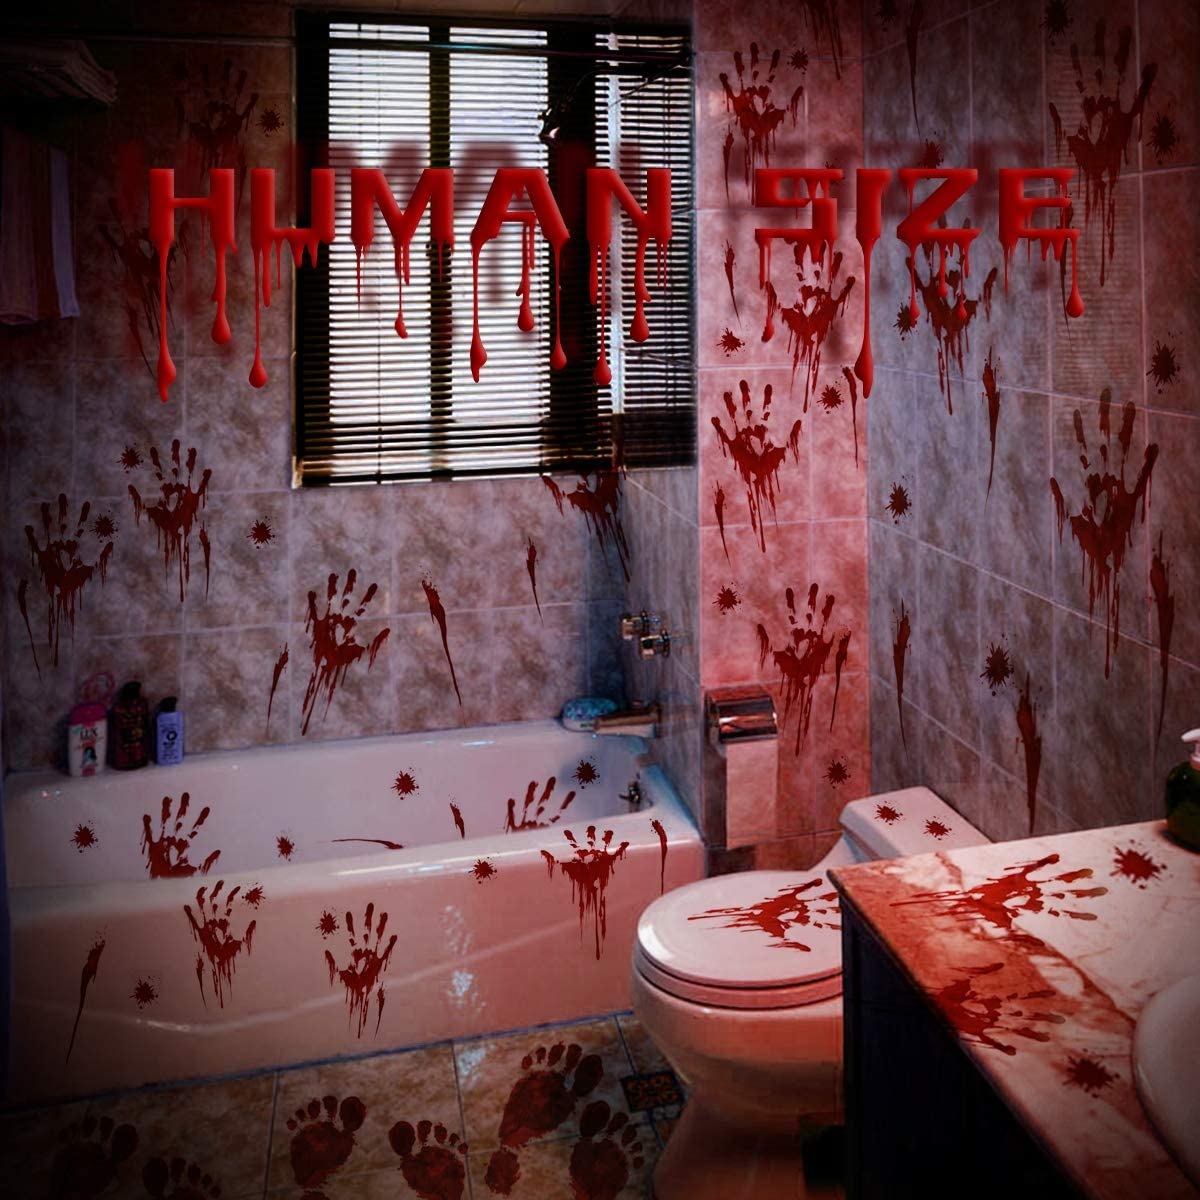 152PCS Halloween Bloody Window Footprint Stickers Direct stock discount Handpri New popularity